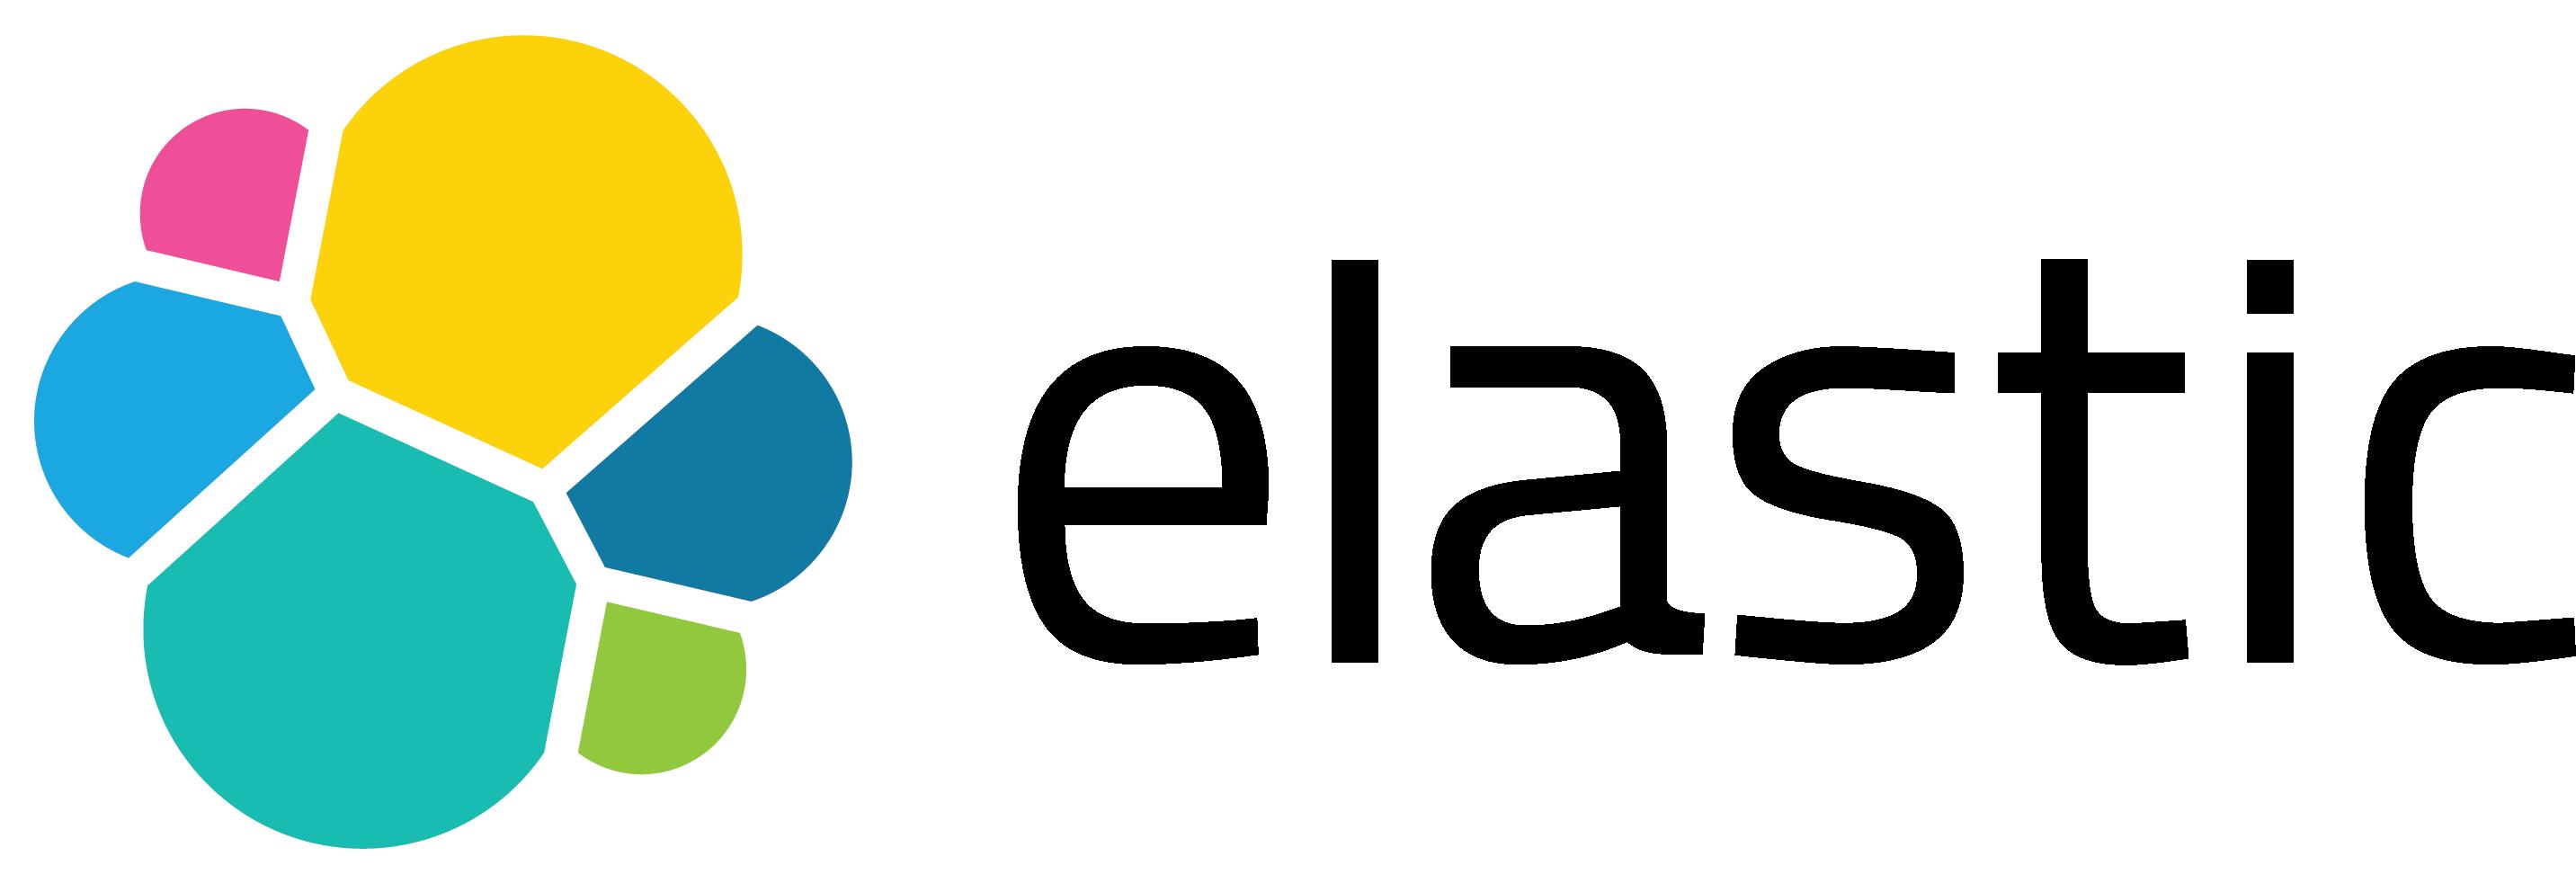 elasticsearch logotipo